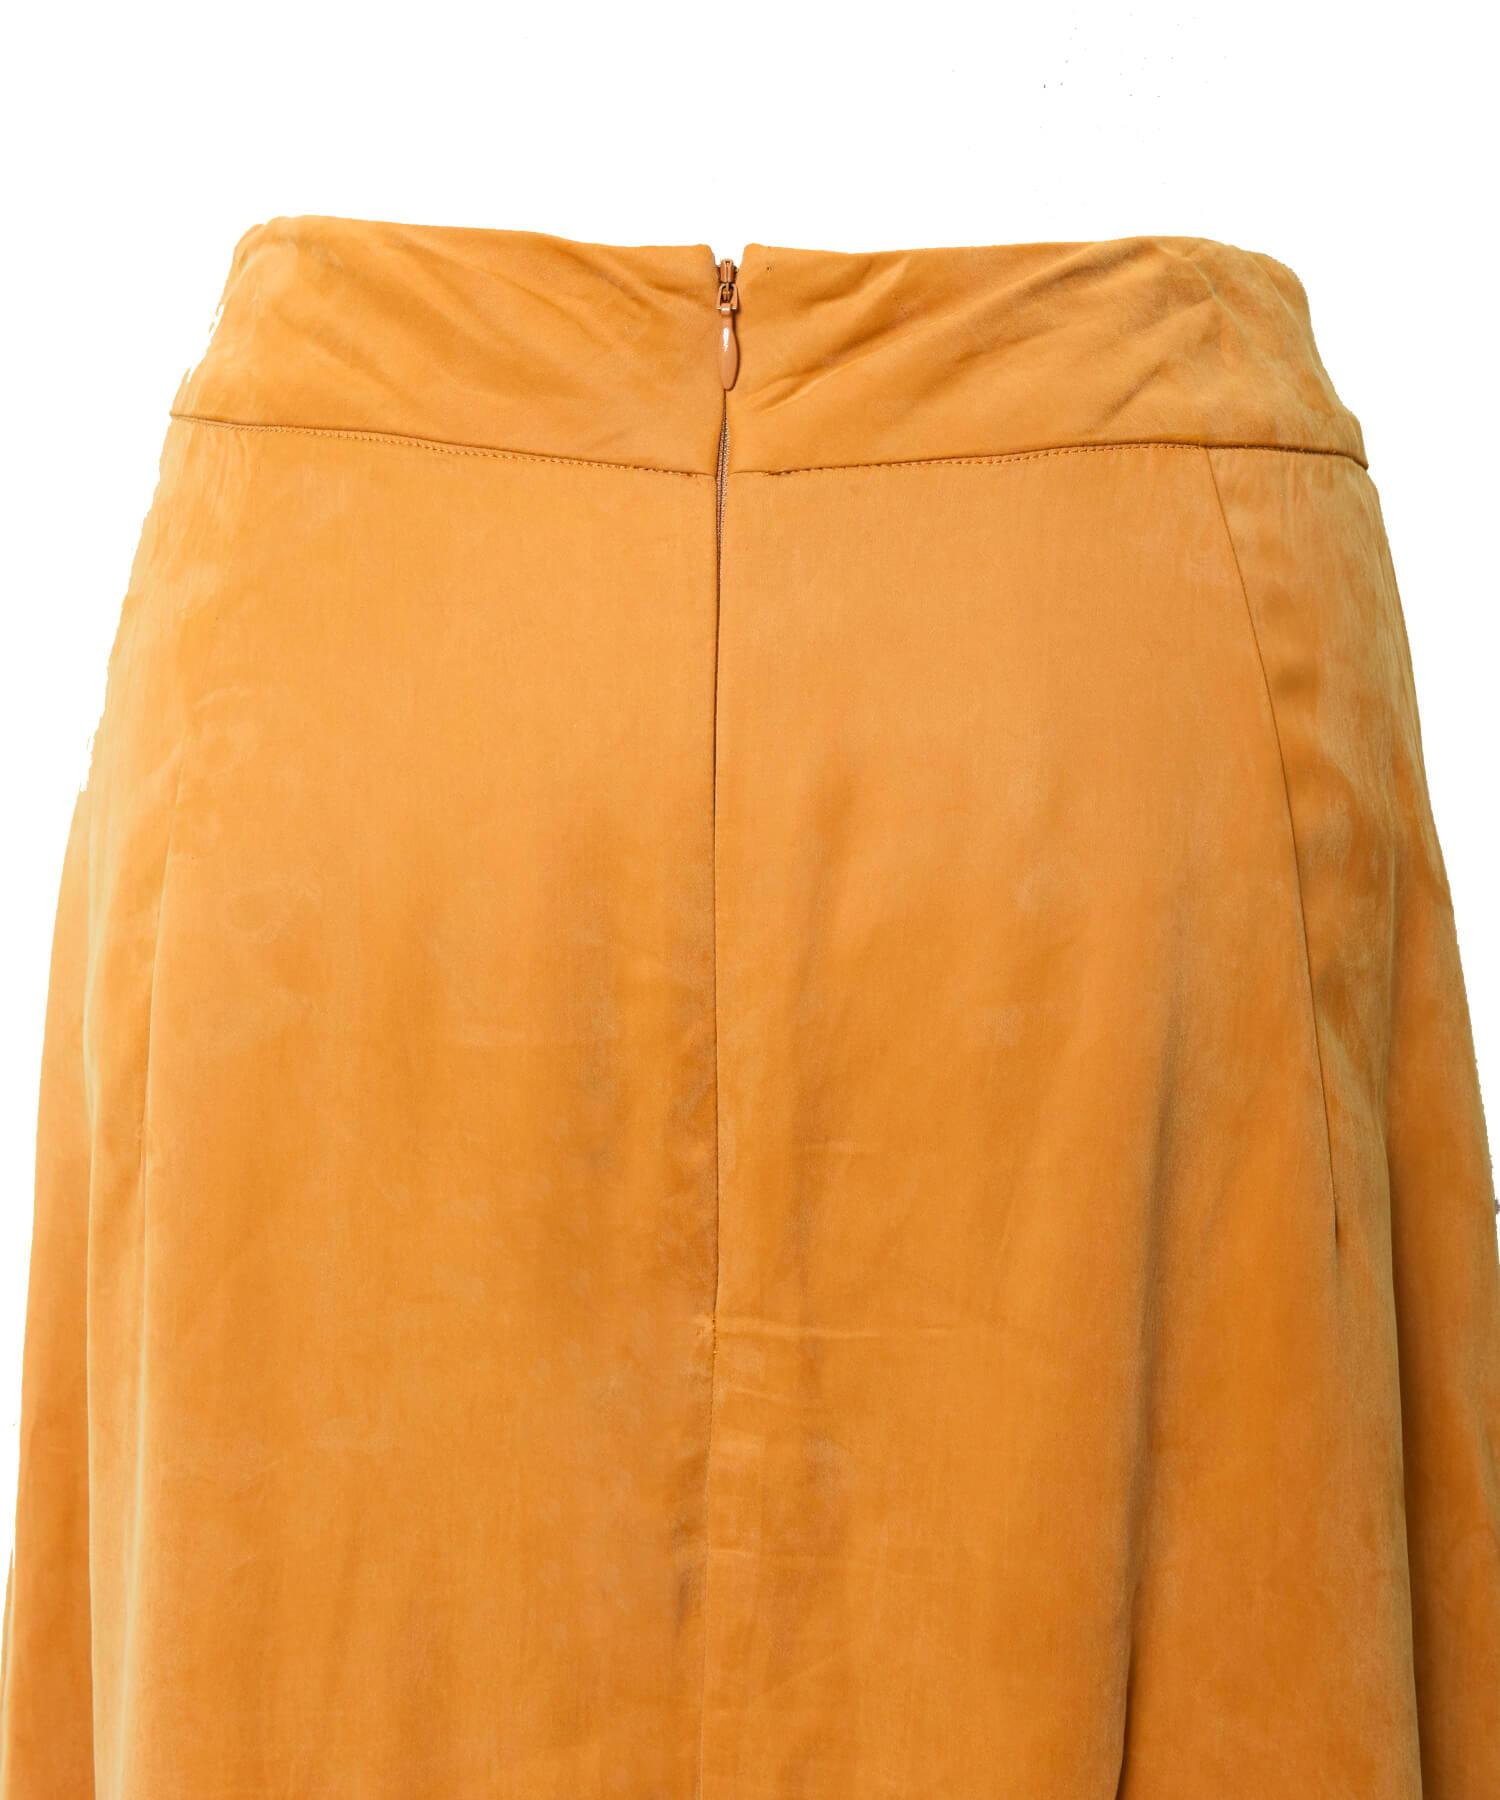 Cupra Skirt Pants / yellow